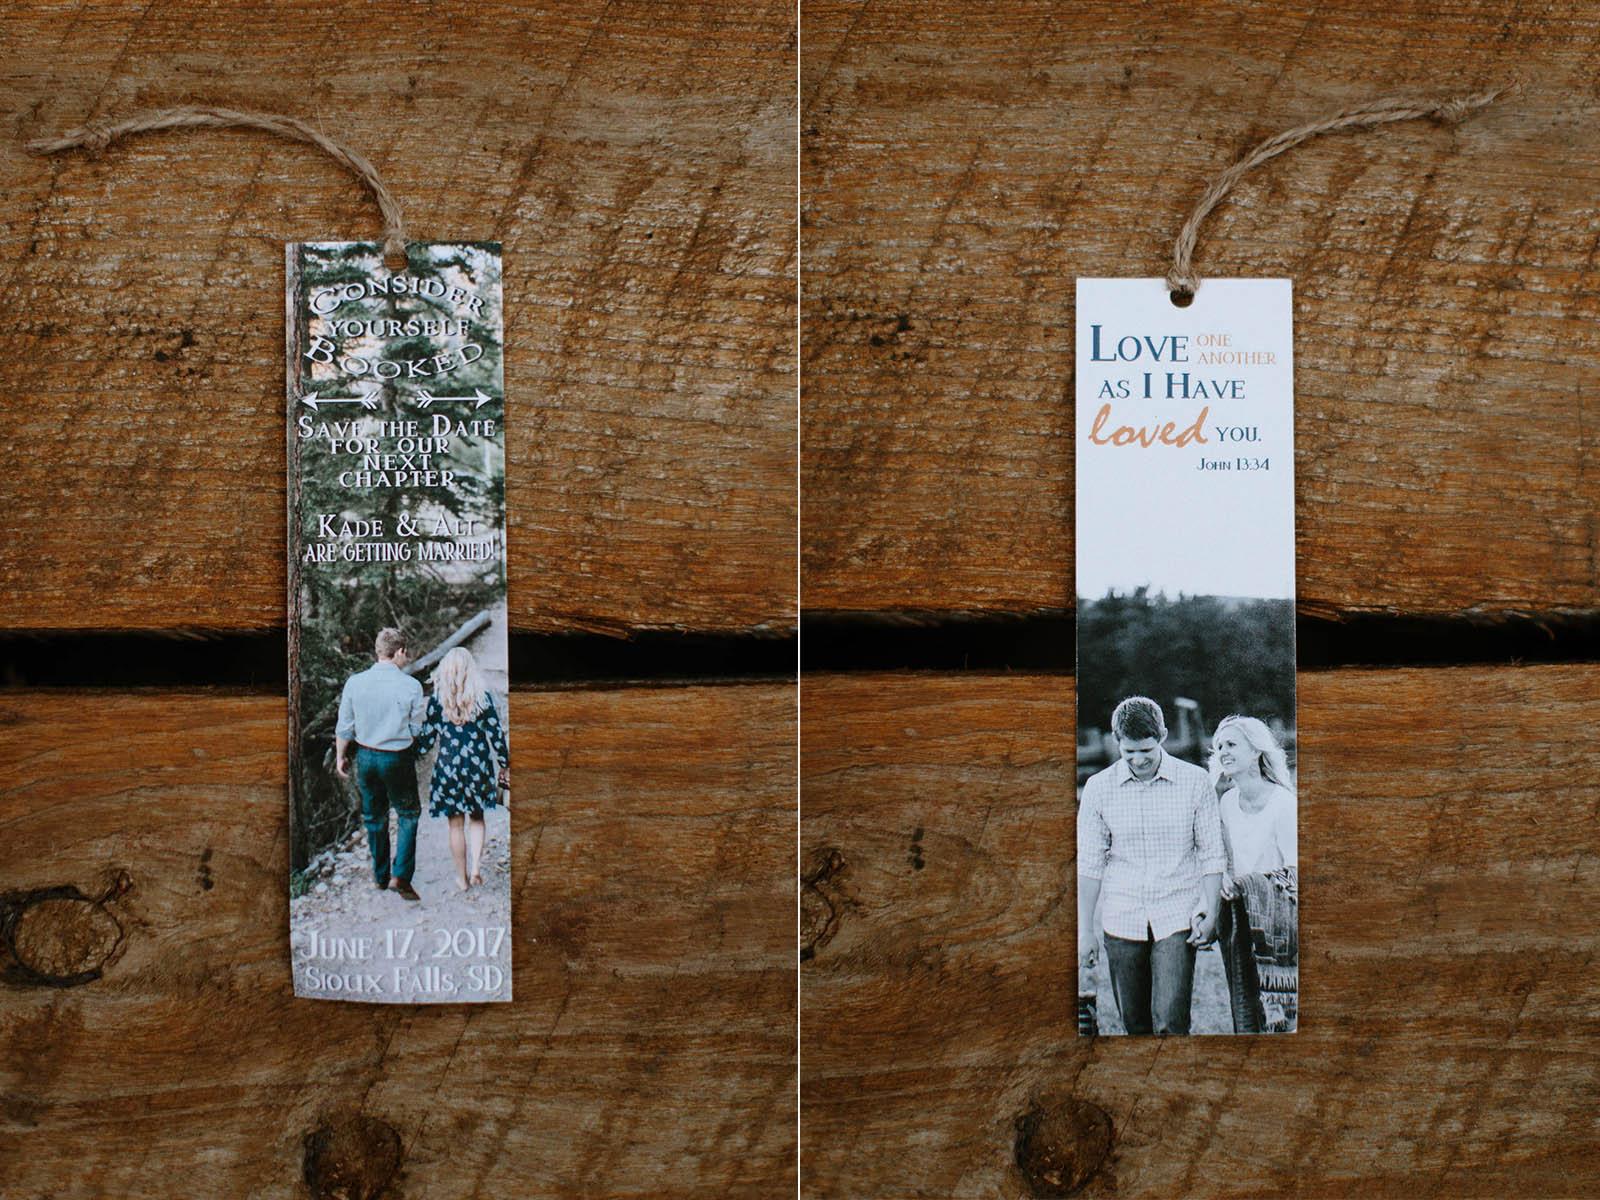 meadow-barn-wedding-sioux-falls-south-dakota-romantic-adventerous-michael-liedtke-photography003.jpg